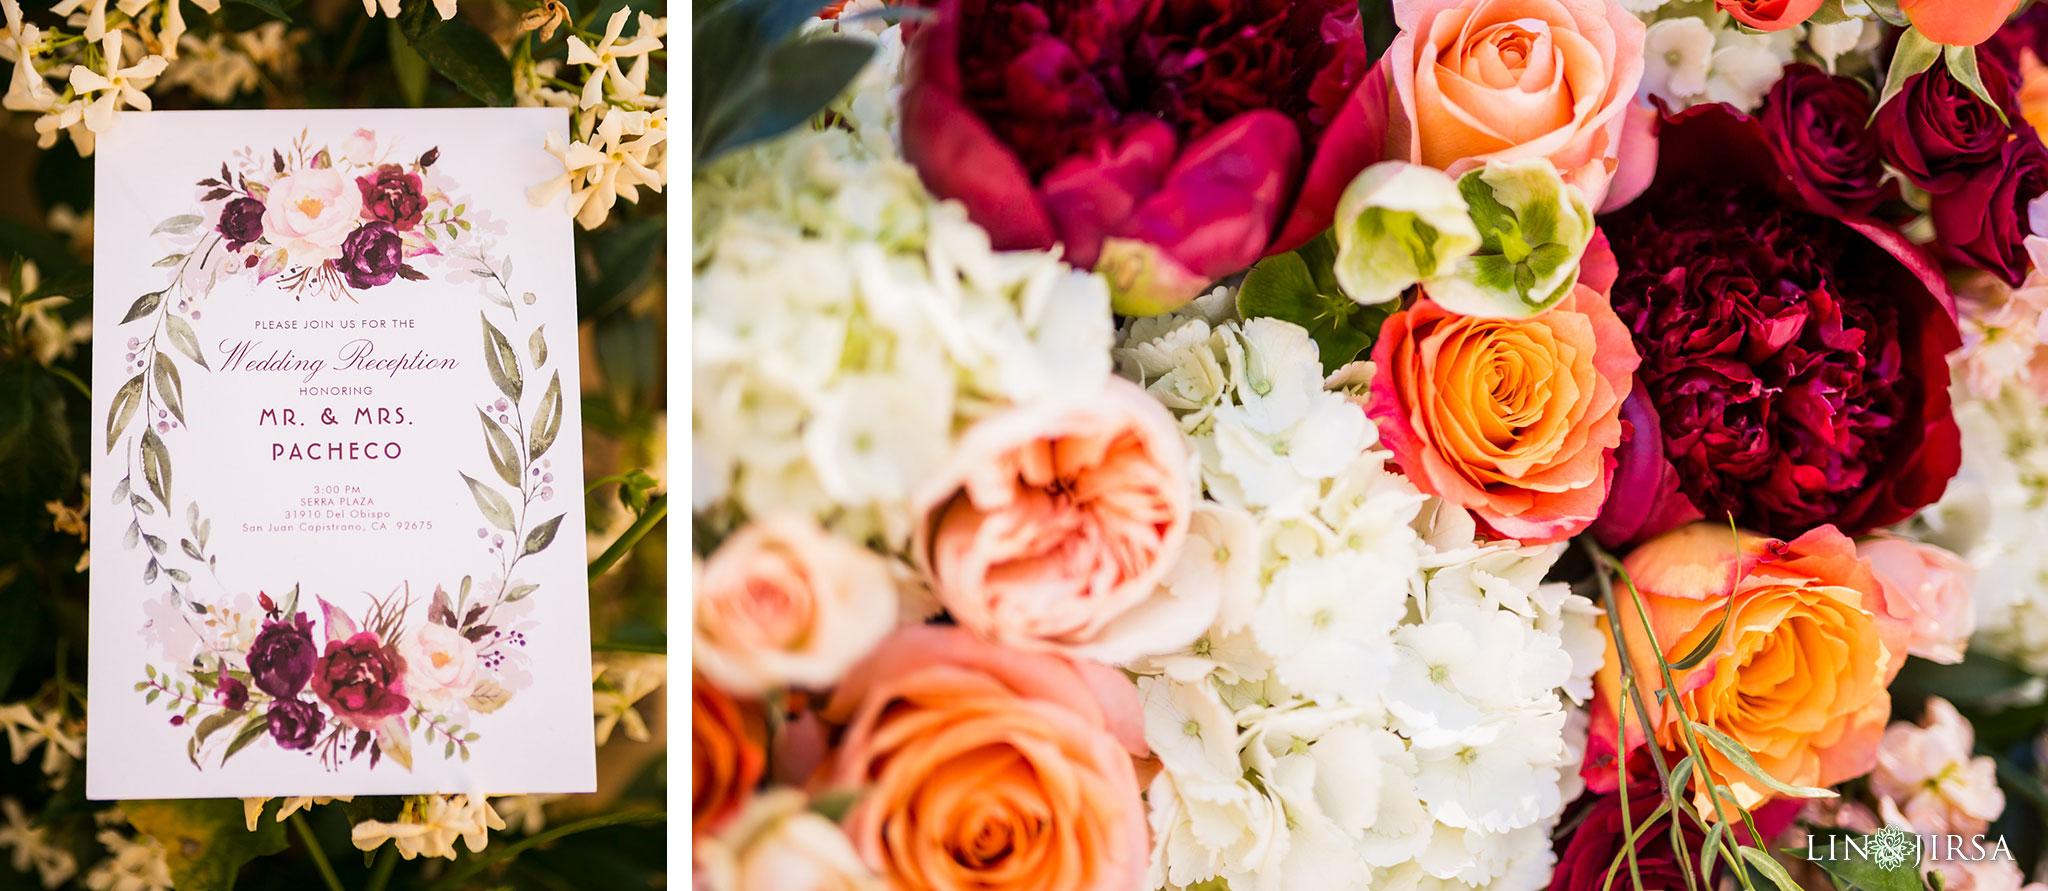 26 serra plaza san juan capistrano wedding ceremony photography